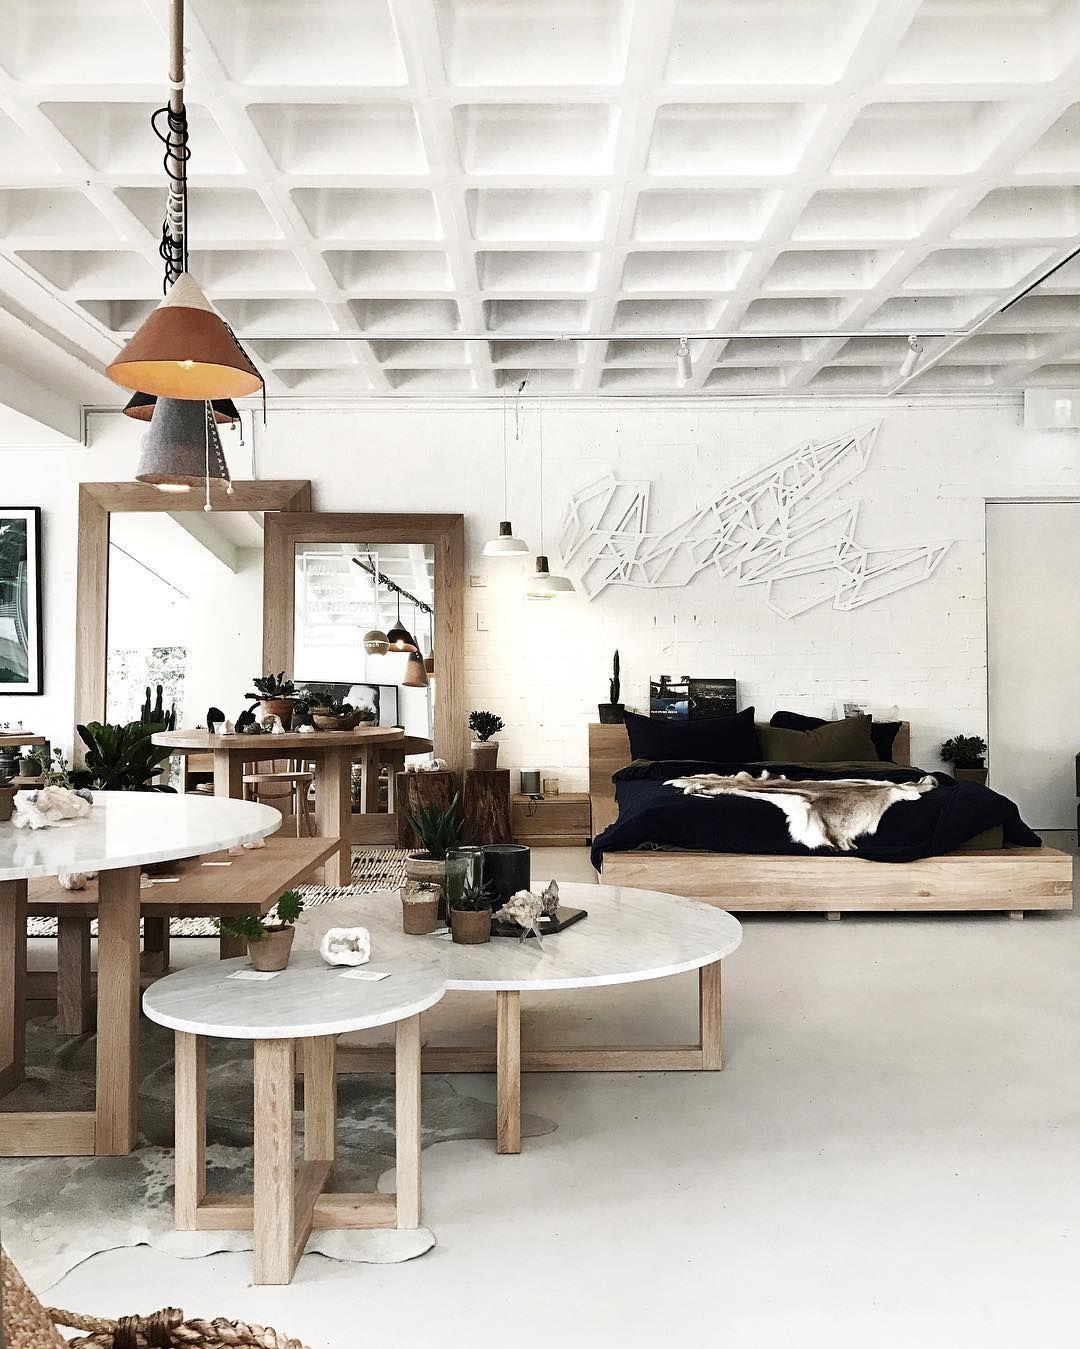 Totem Road amazing home decor store in Bondi Beach